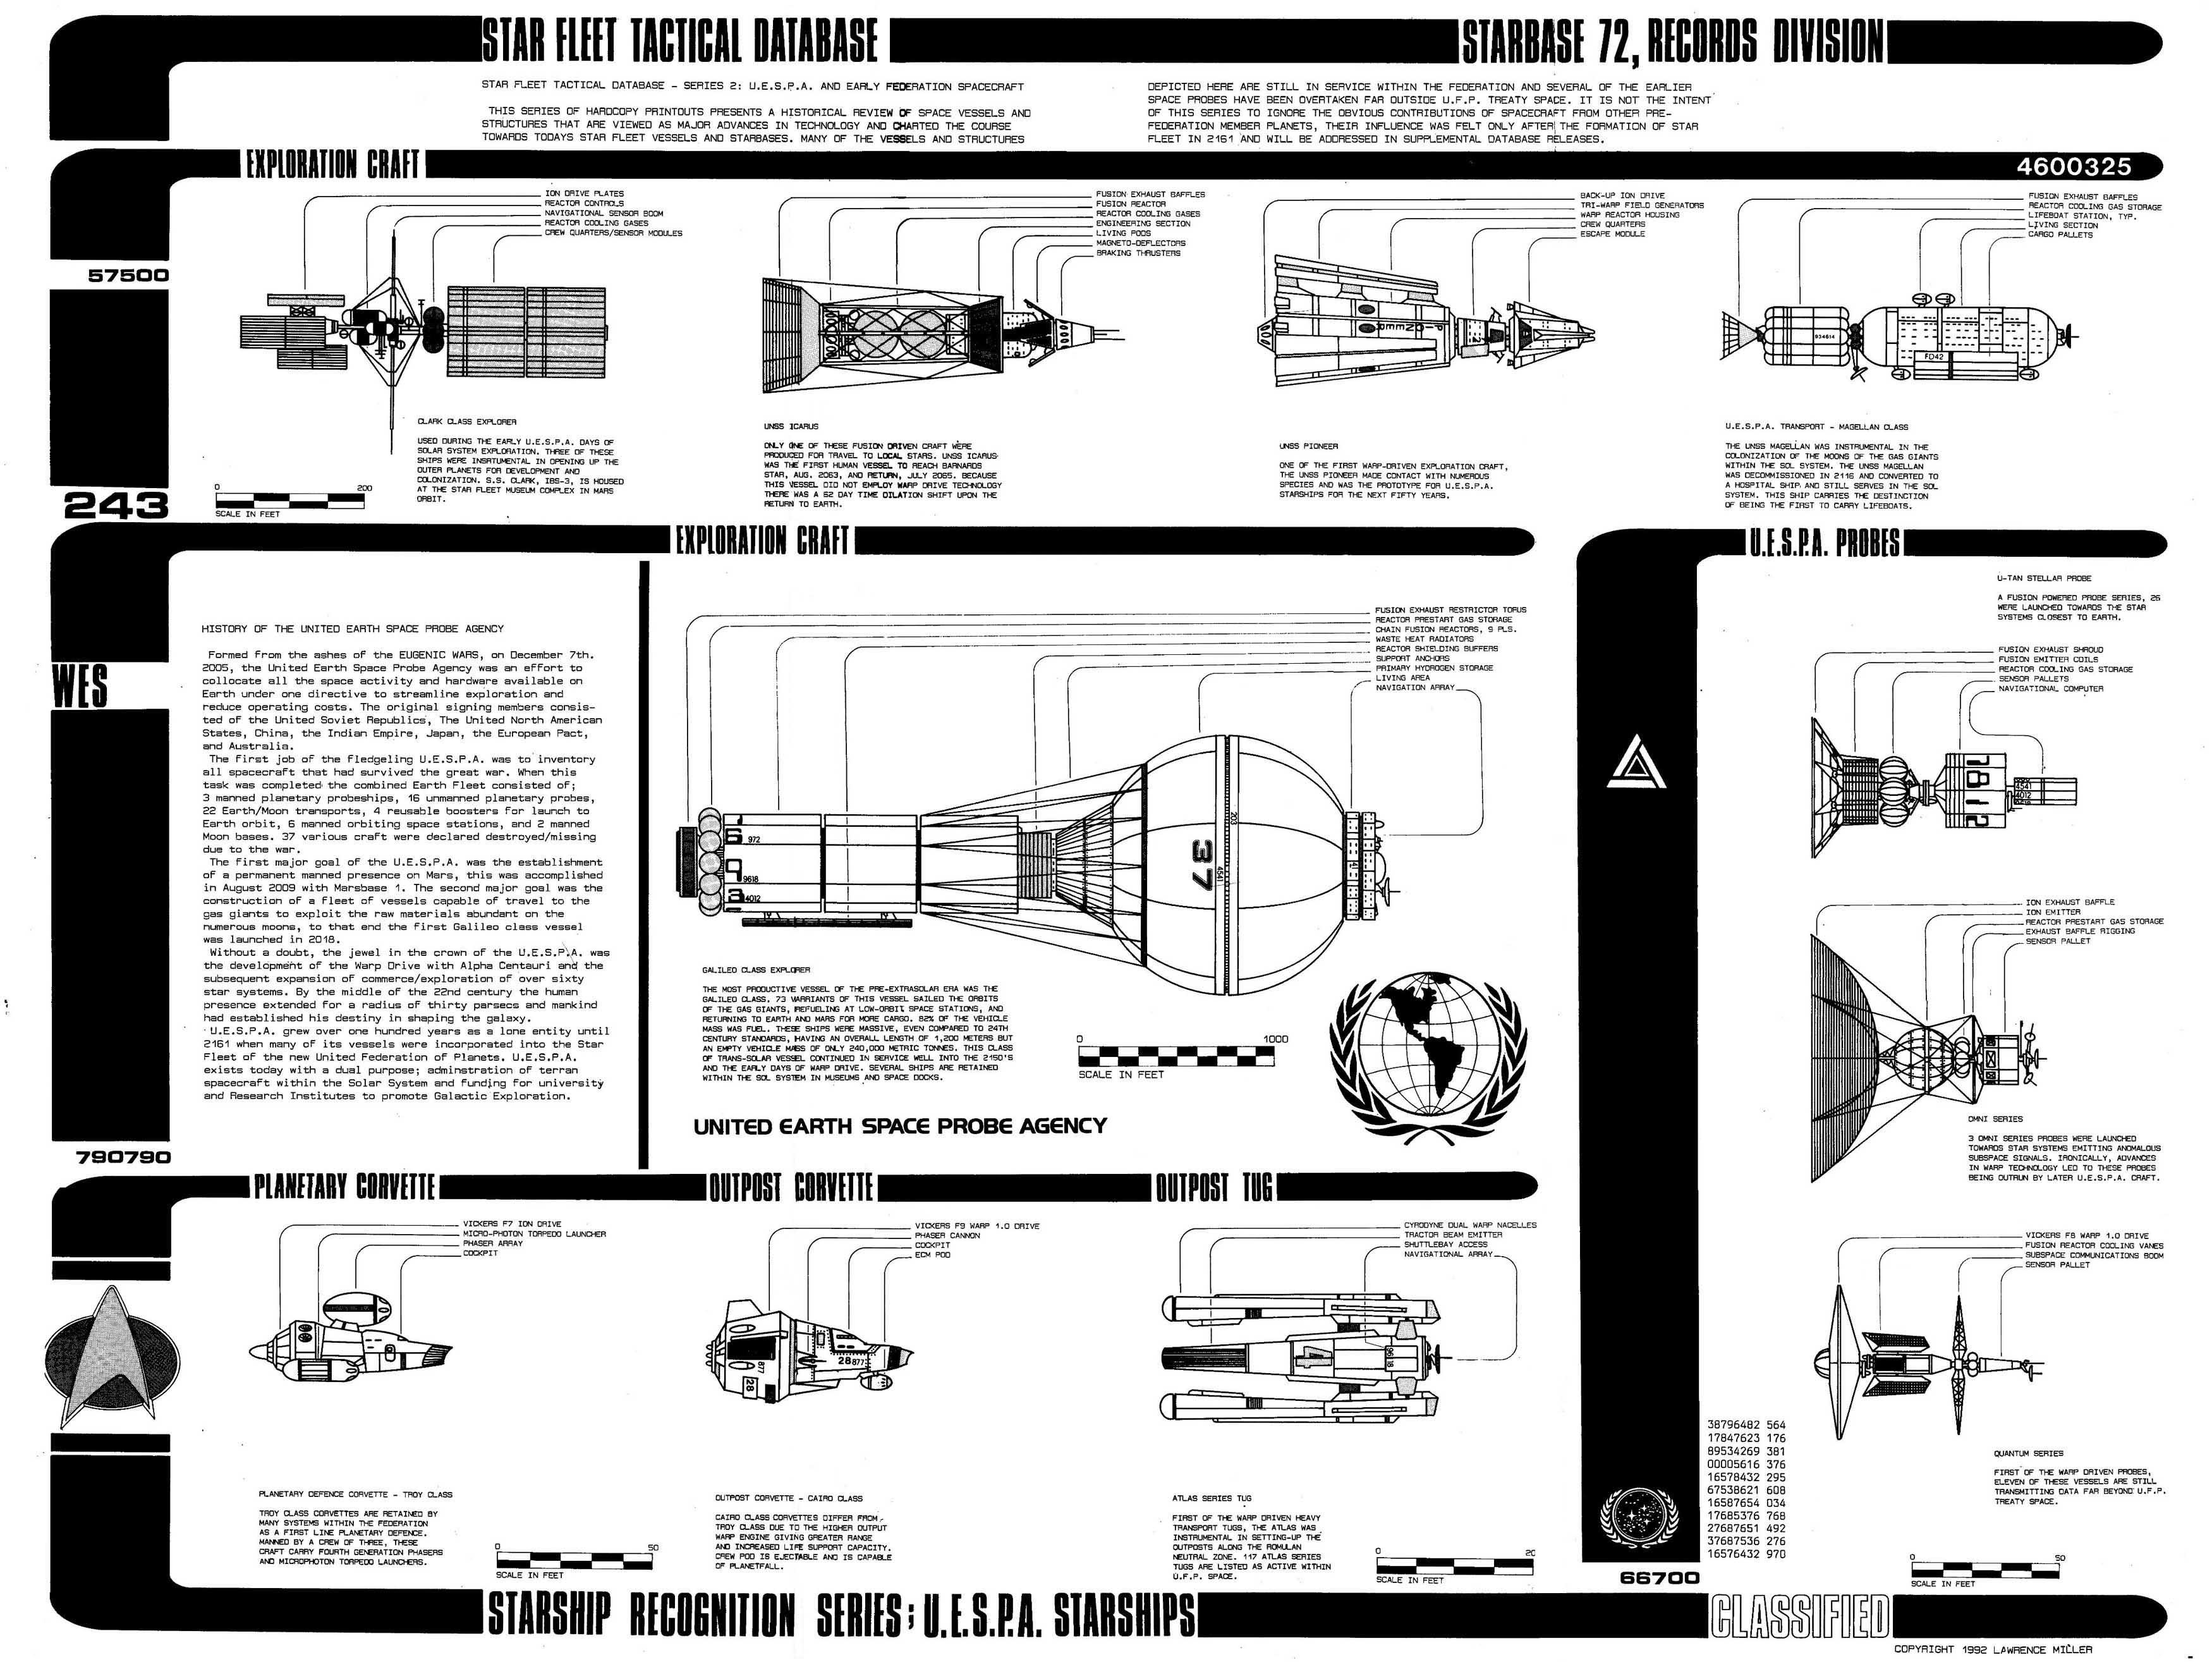 Star Trek Blueprints: Star Fleet Tactical Database Series 2